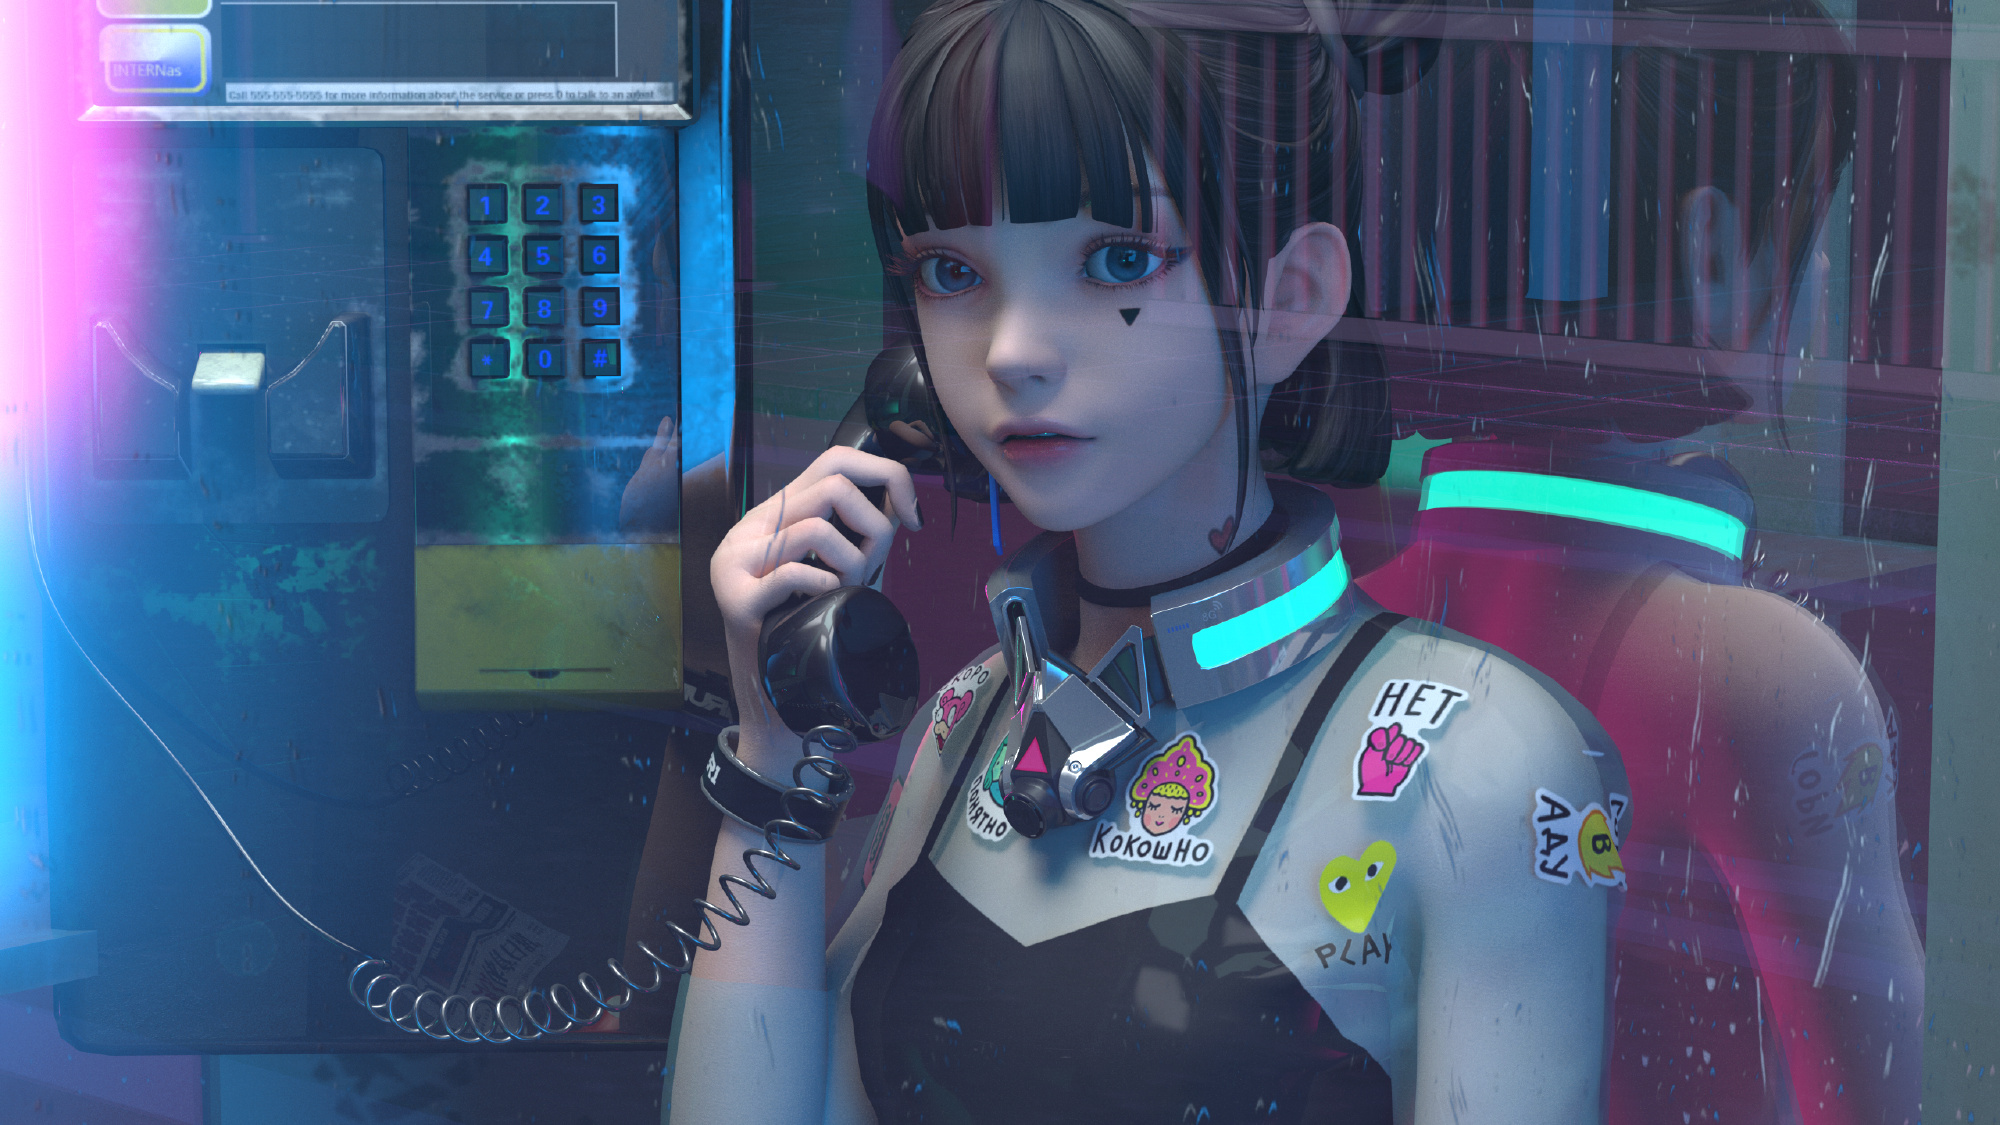 Anime 2000x1125 JYANME anime girls anime telephone booth black hair digital art 3D CGI render women reflection